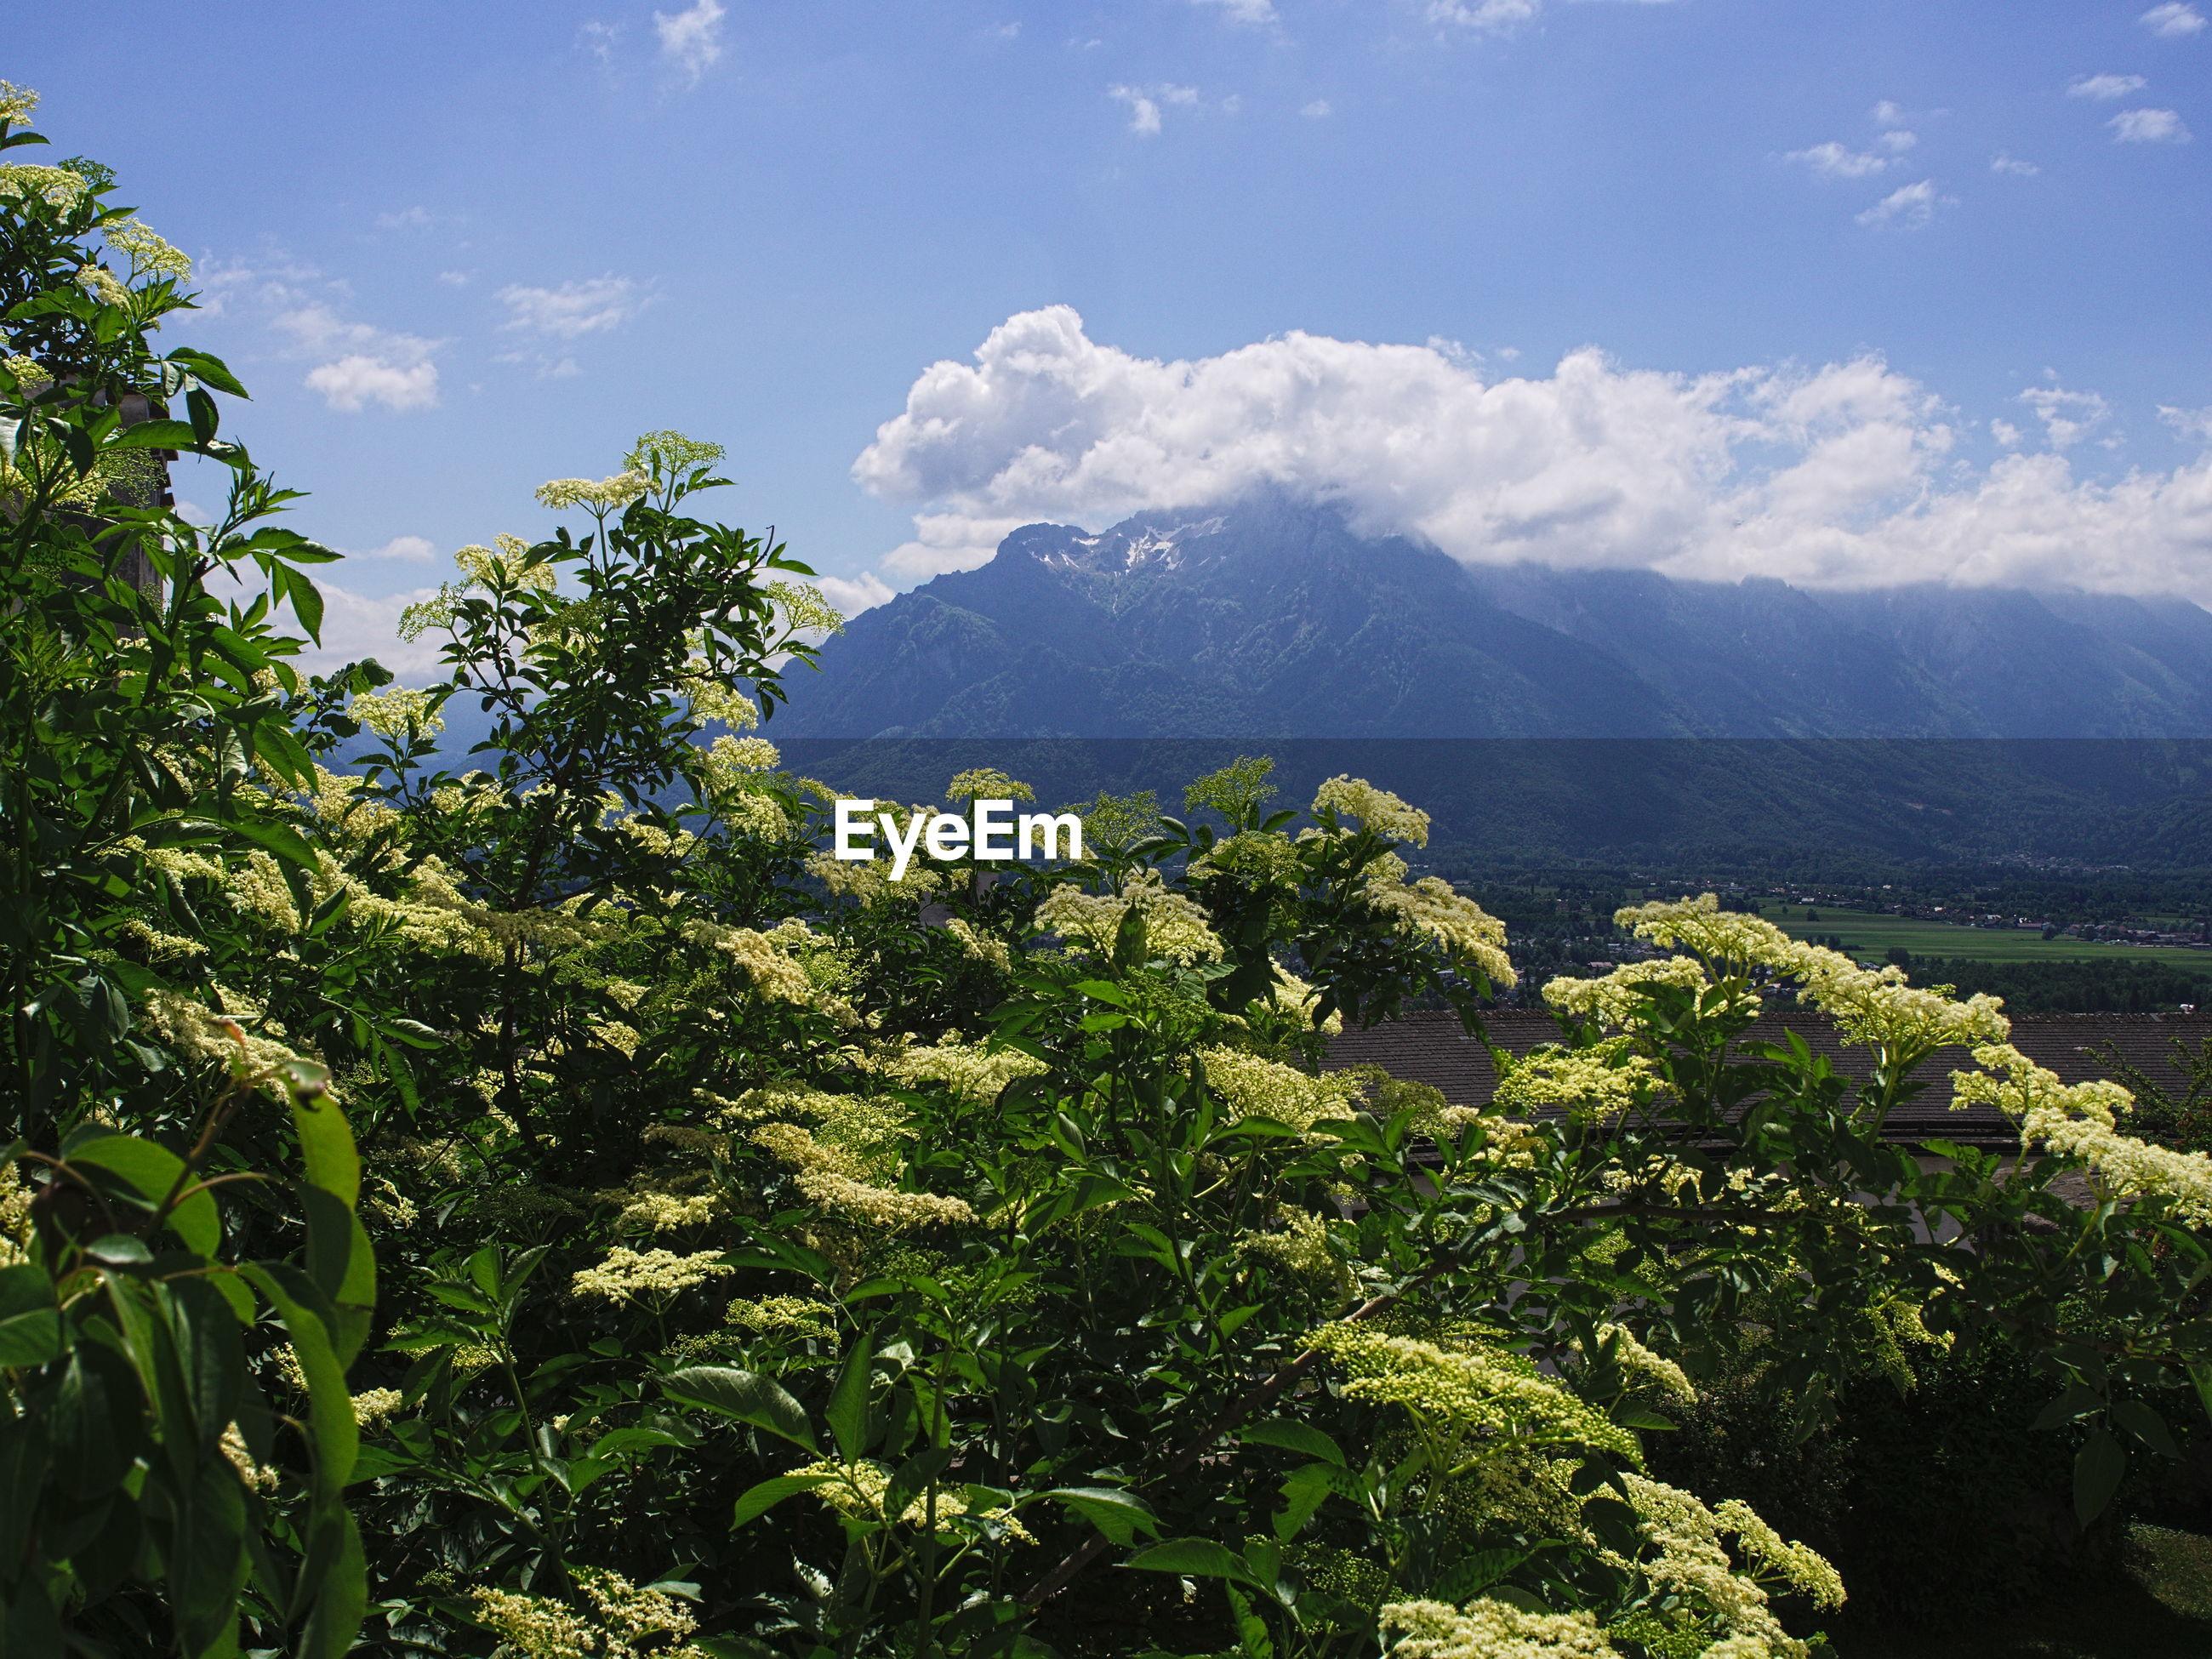 TREES AGAINST MOUNTAIN RANGE